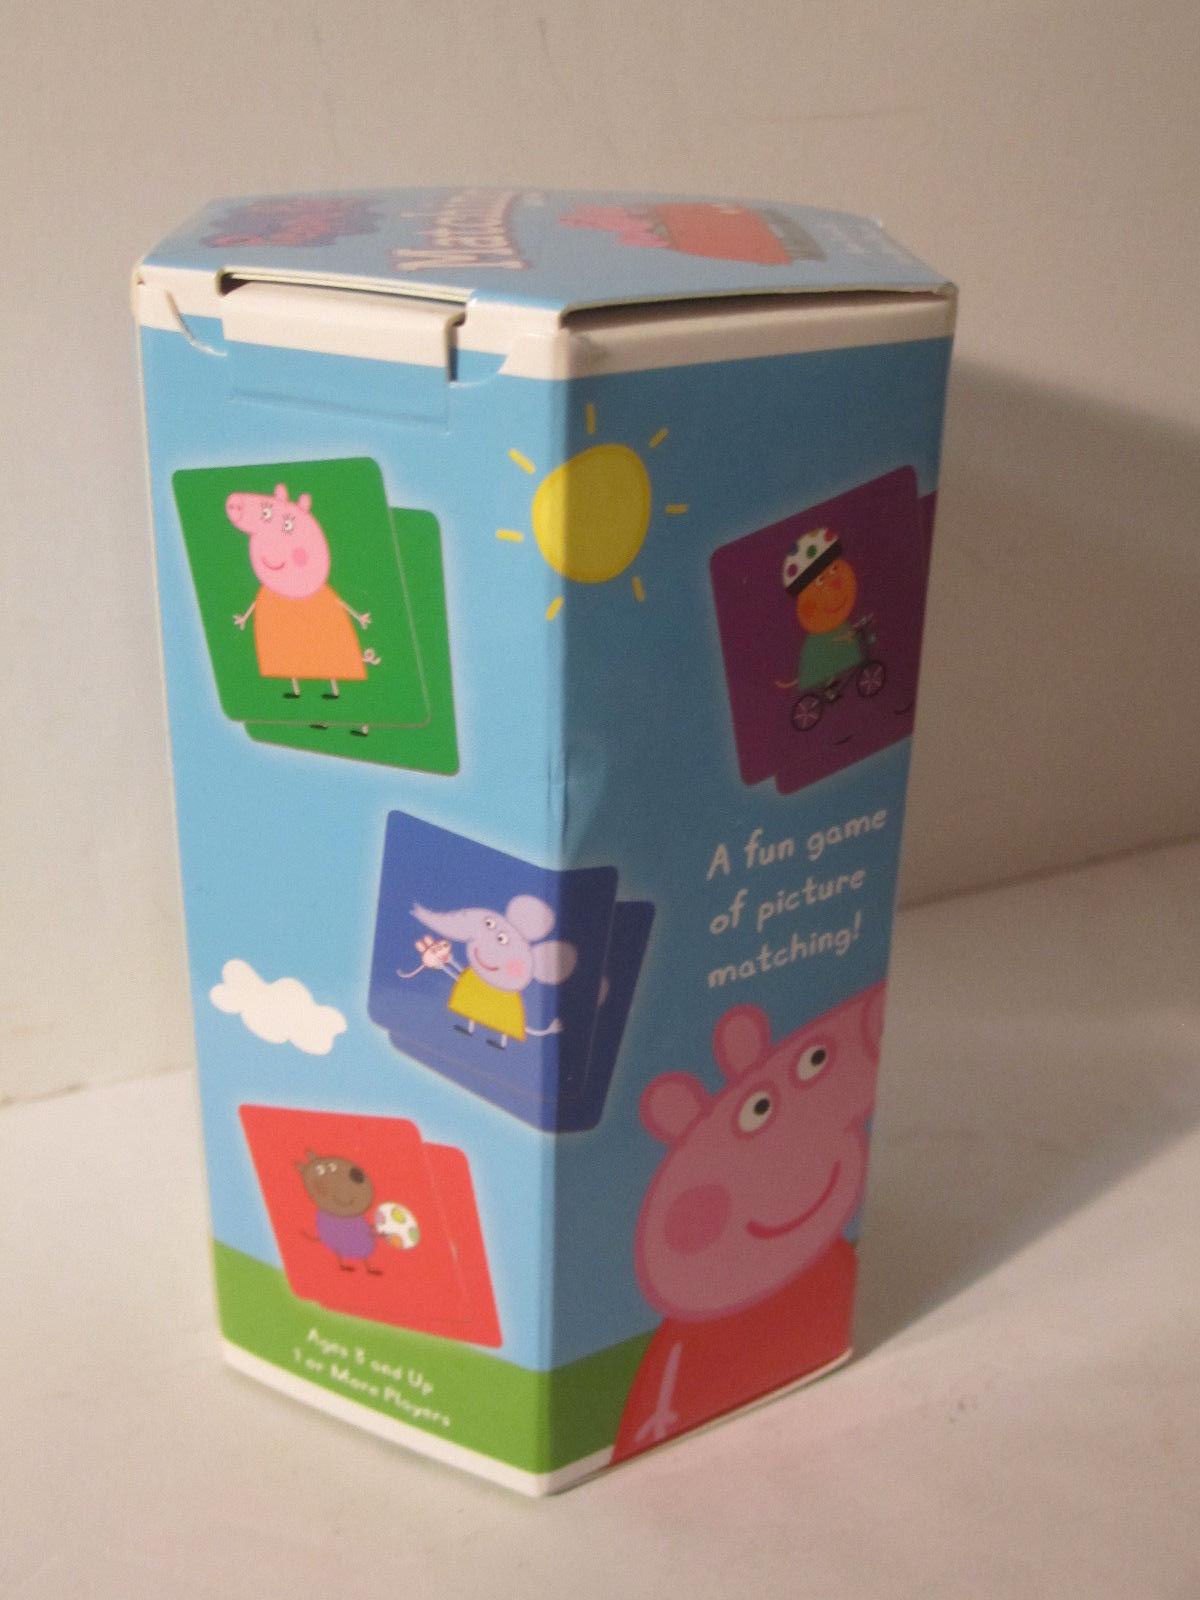 Peppa Pig Matching Game Sorting Game Toddler PreSchool Fun by Wonderforge NEW image 2